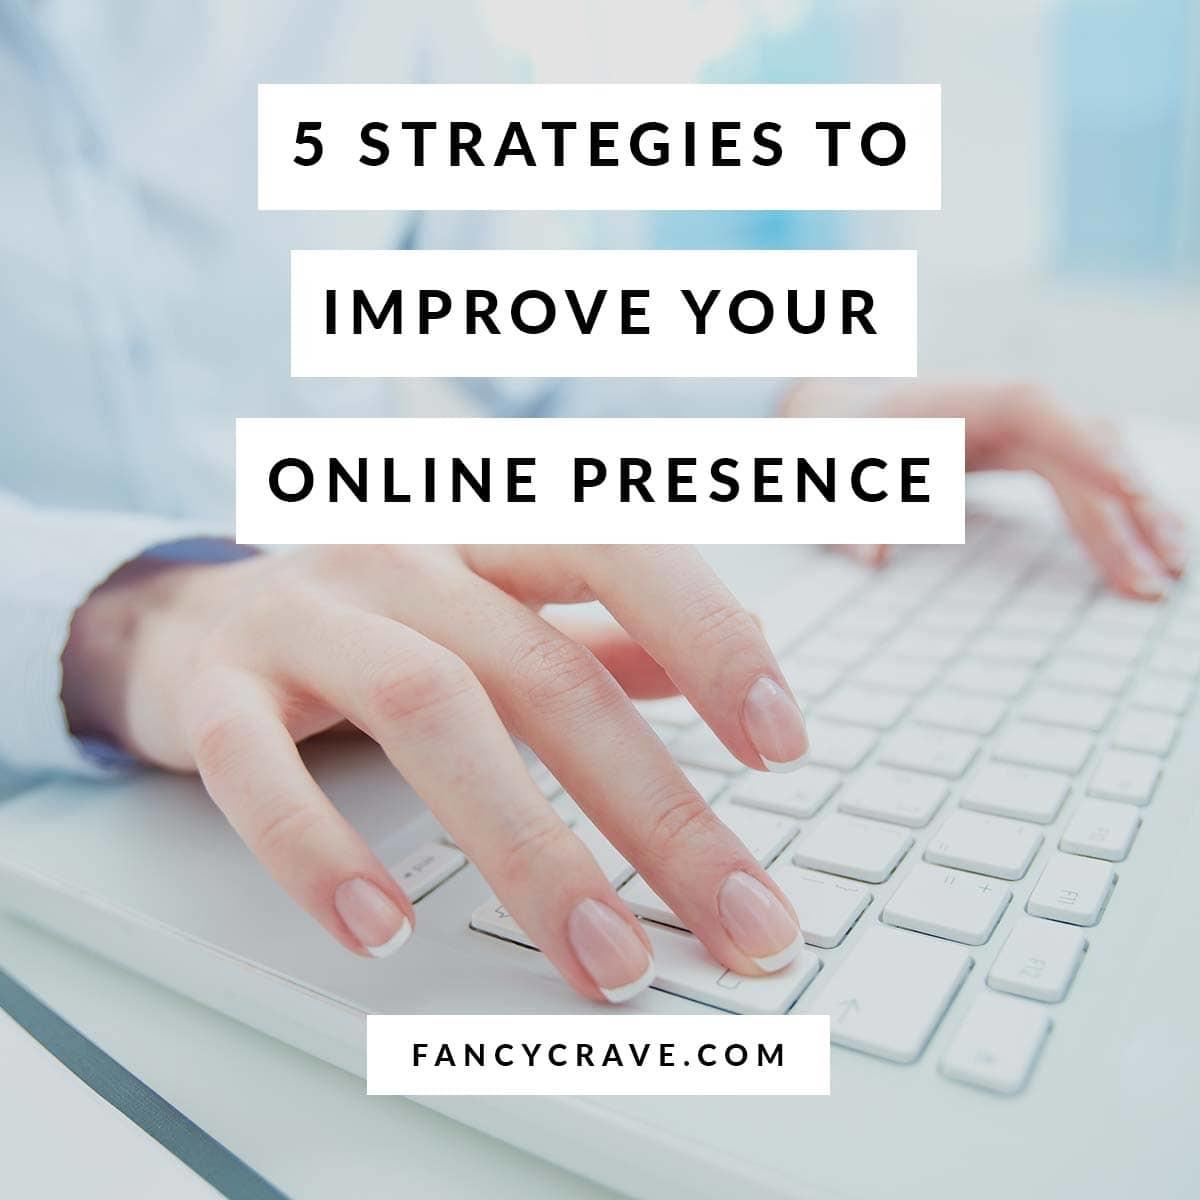 Improve-Your-Online-Presence-min